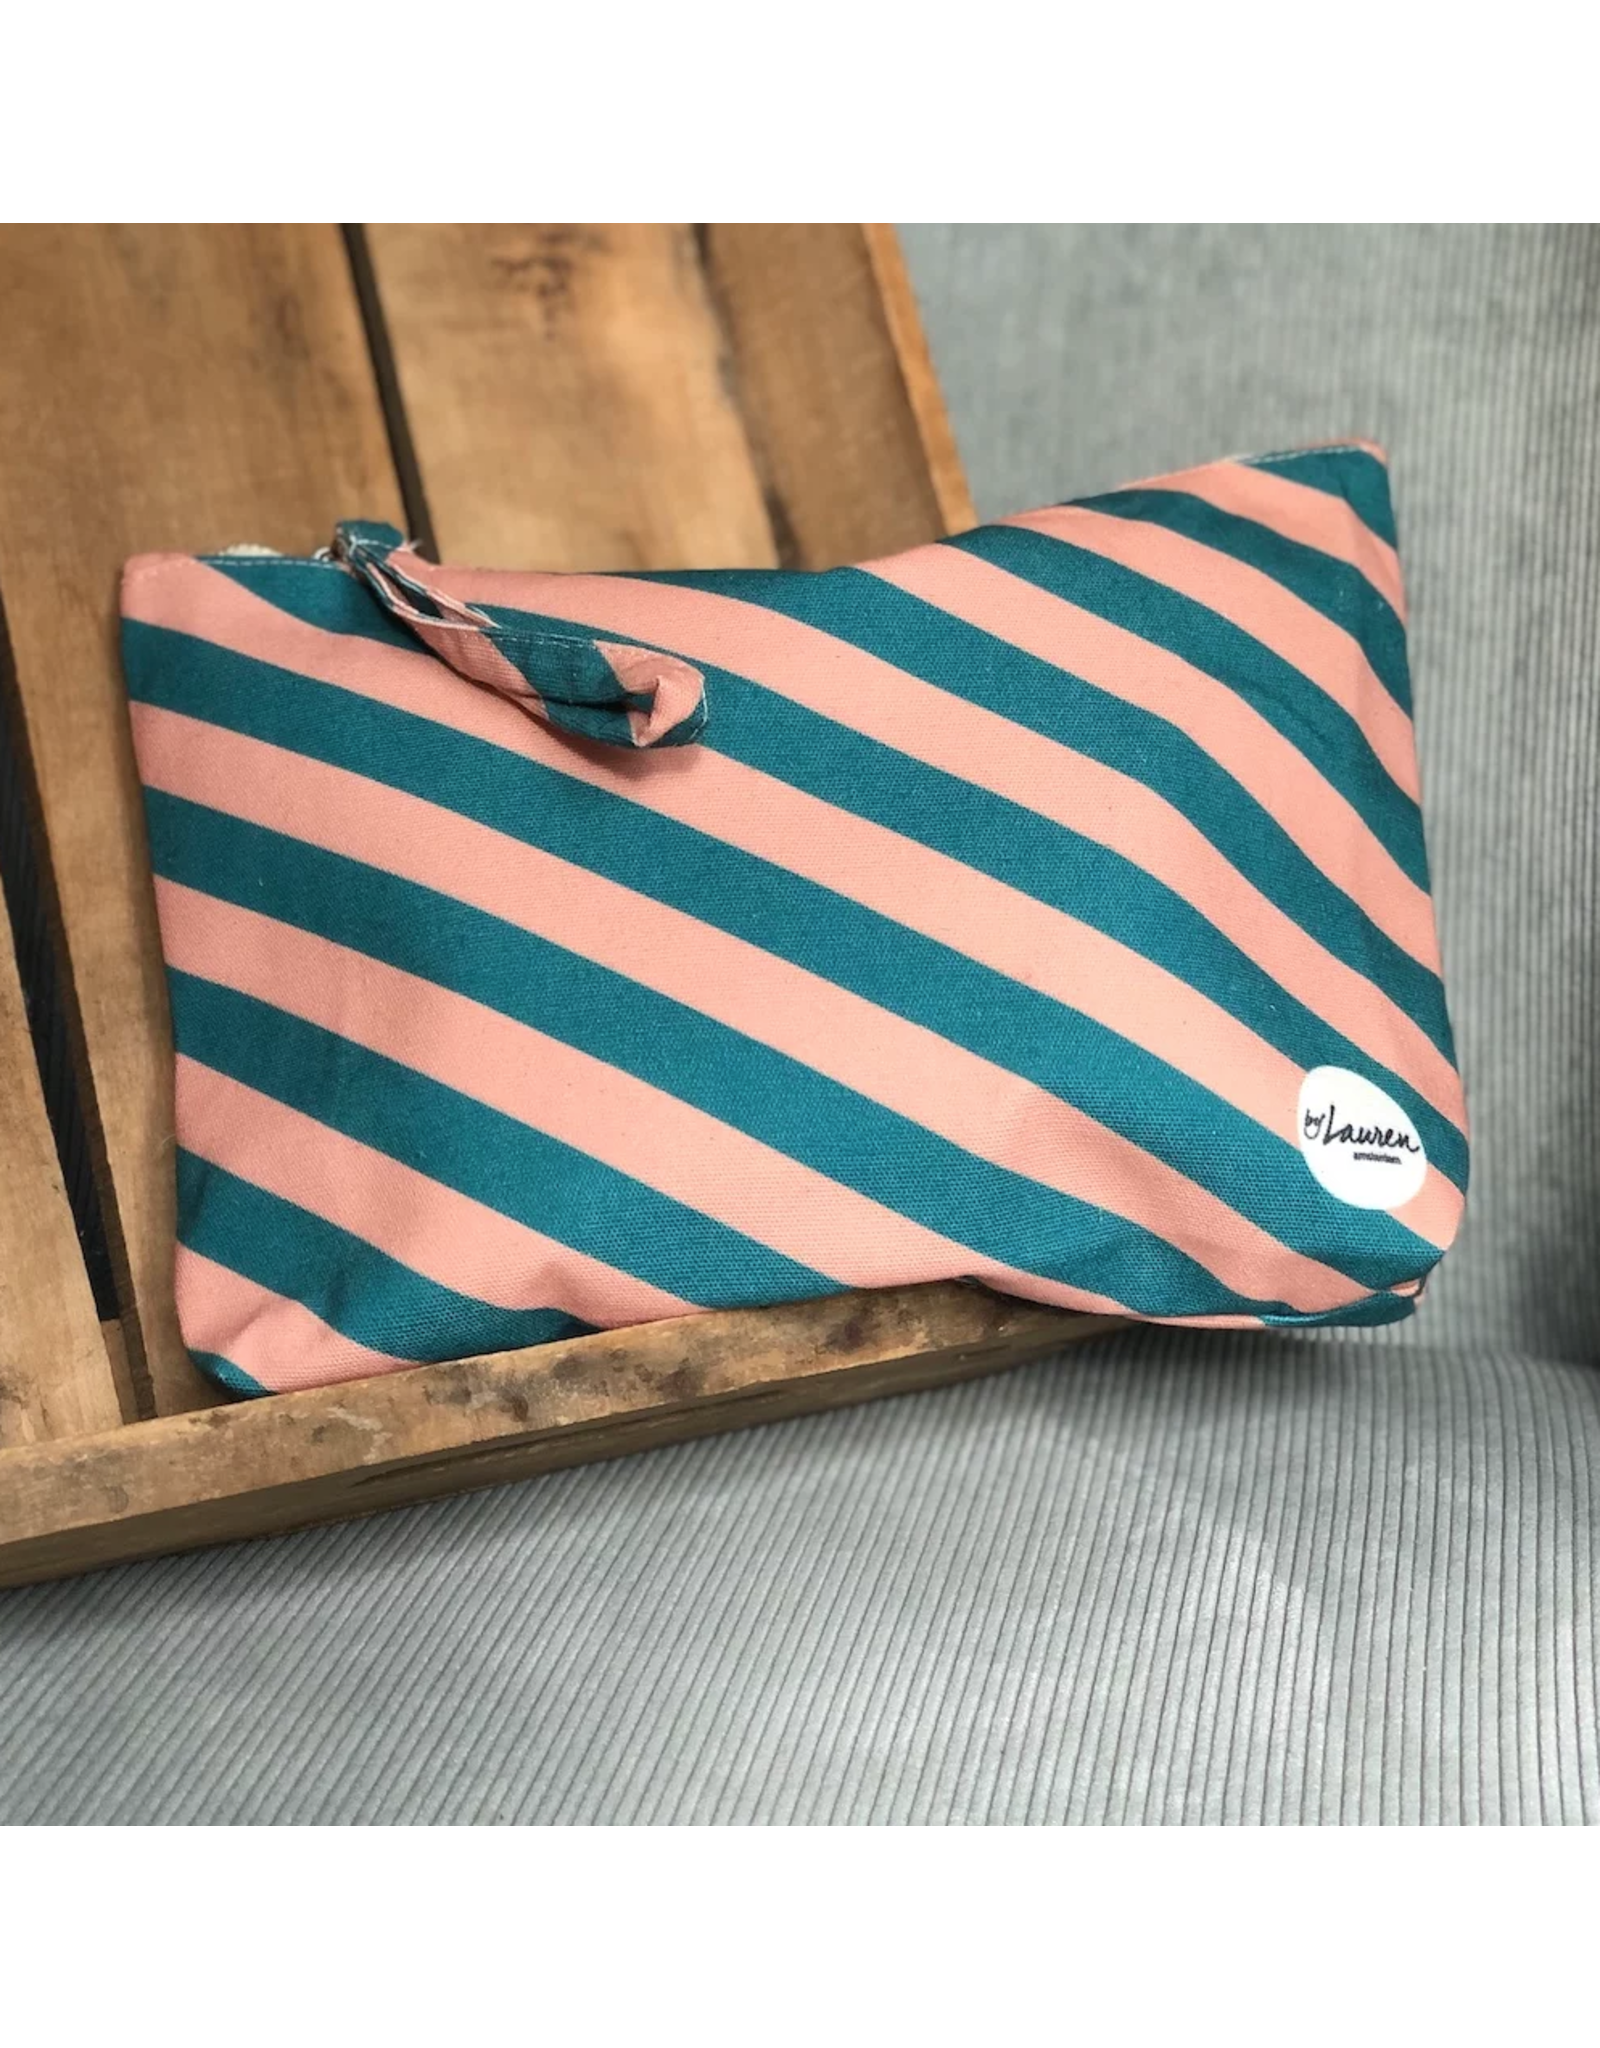 Etui/toiletzak gestreept turquoise/roze